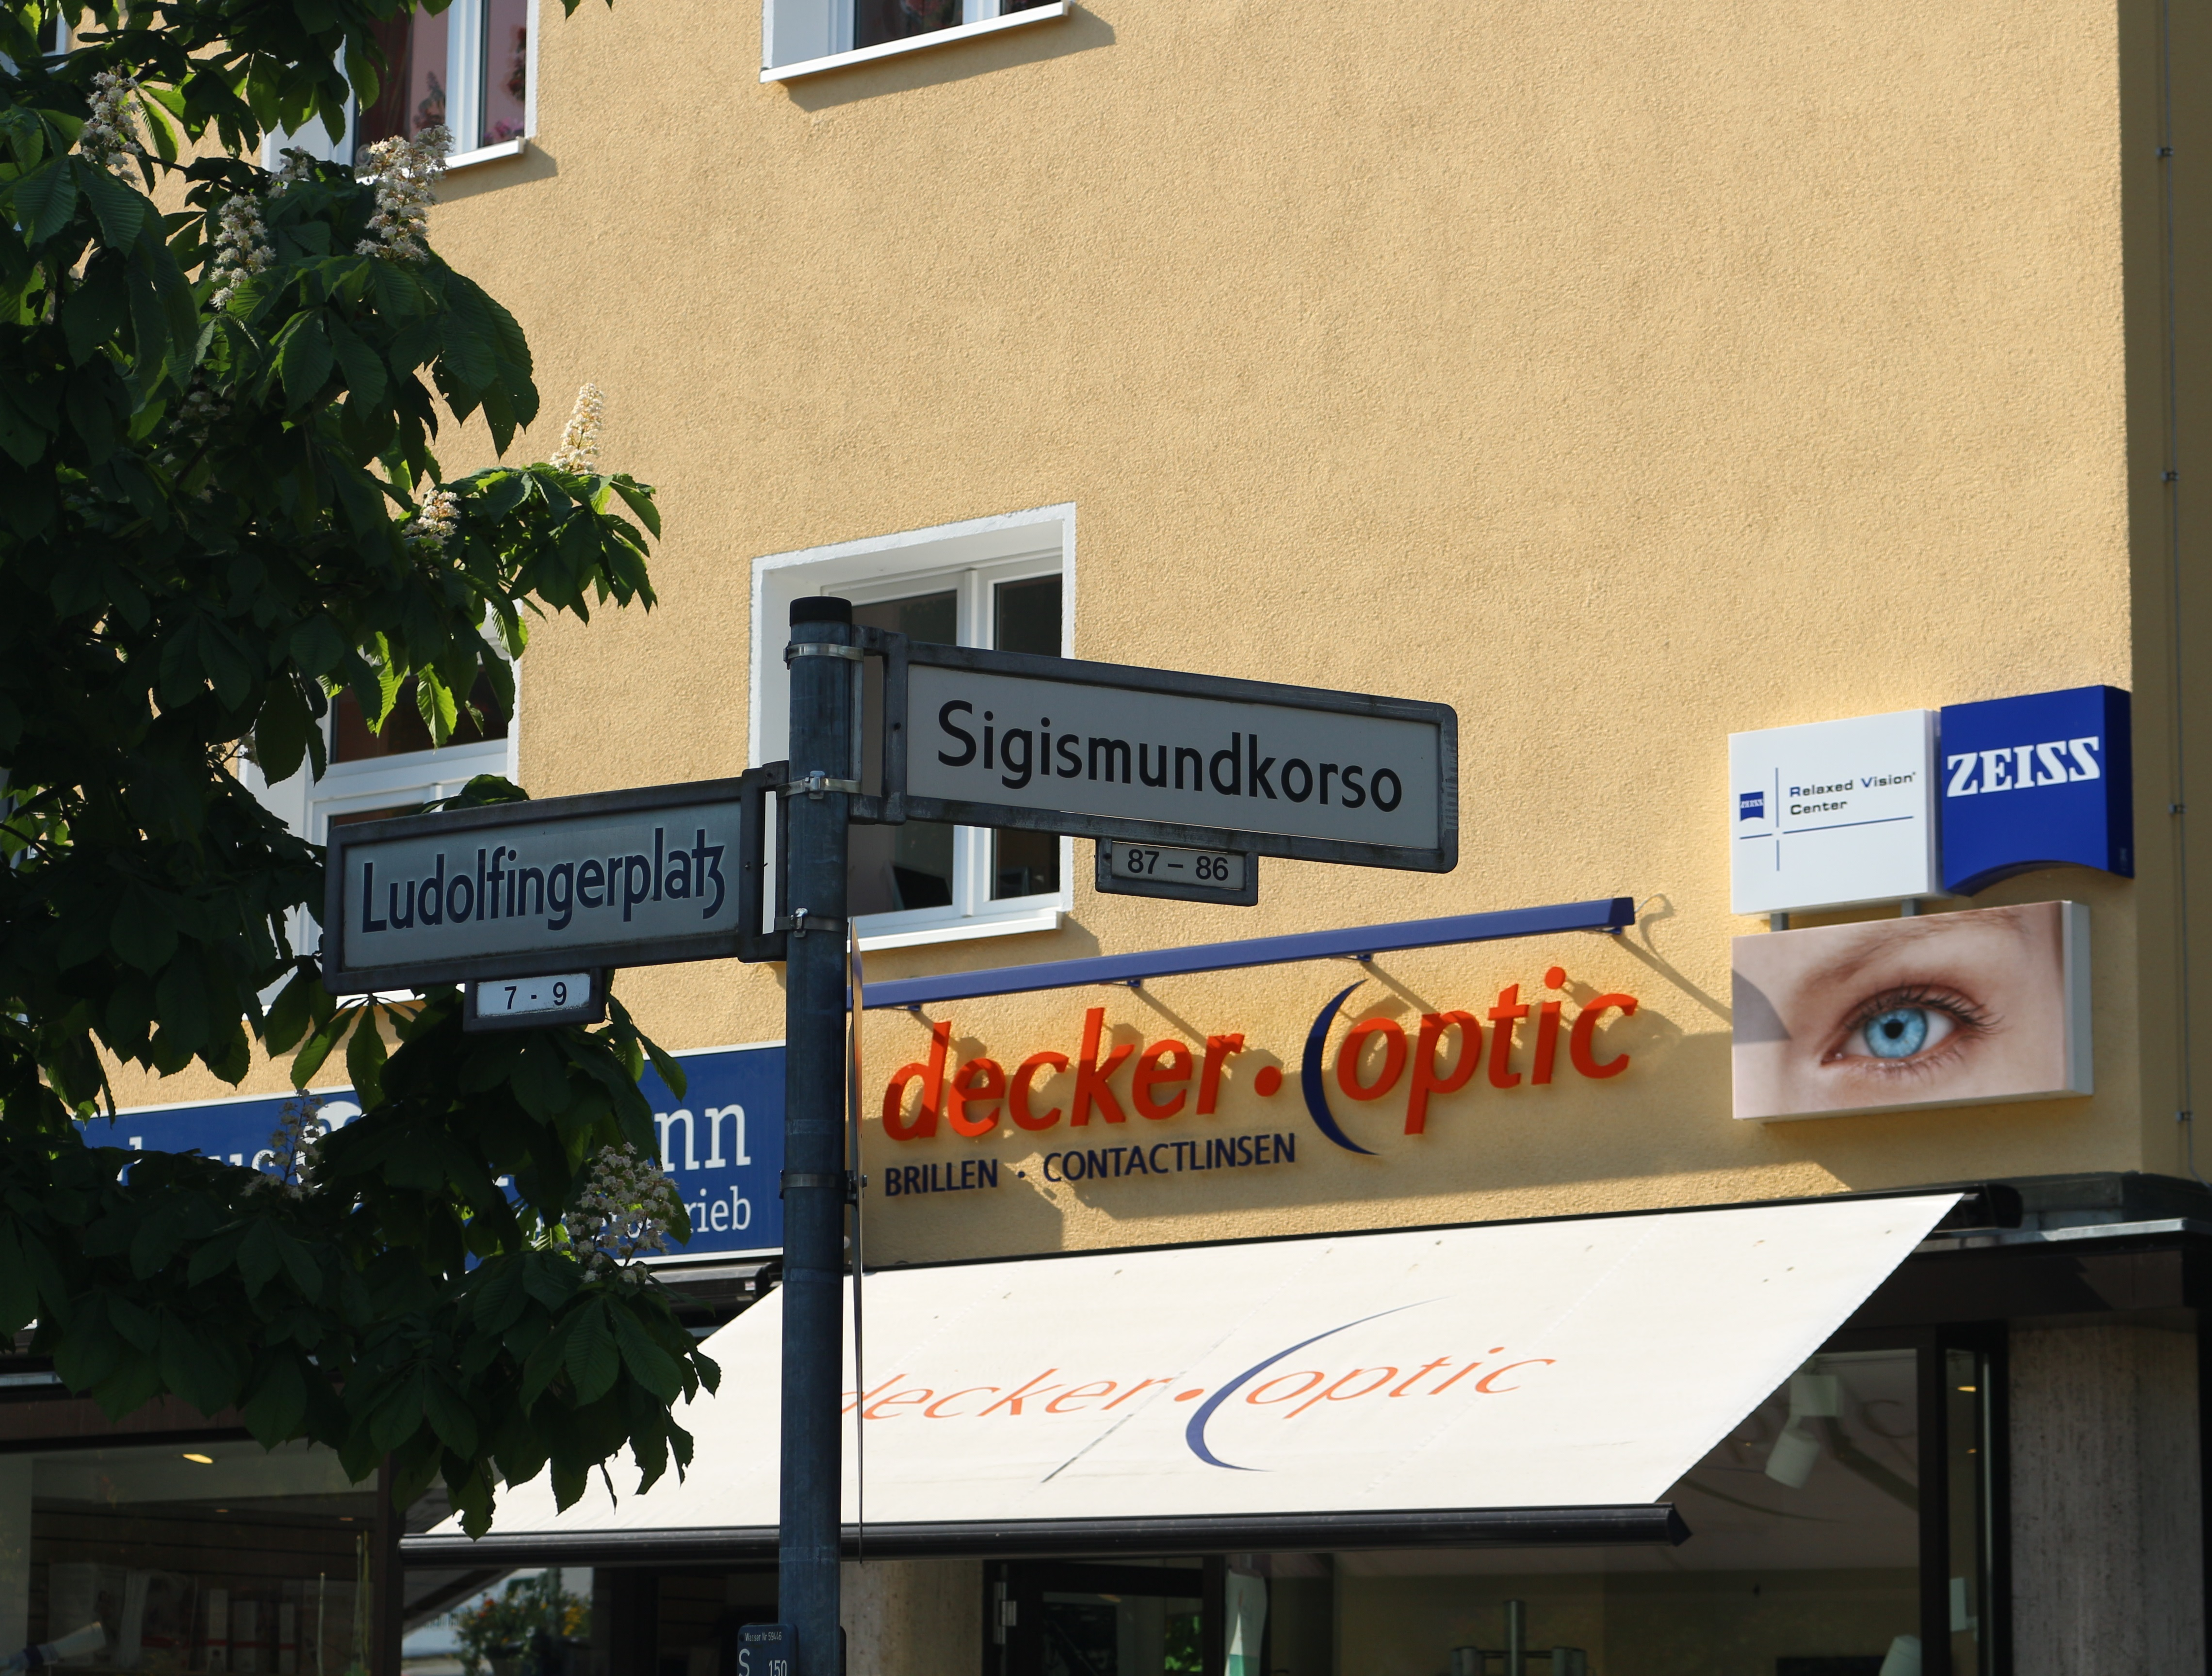 decker optic